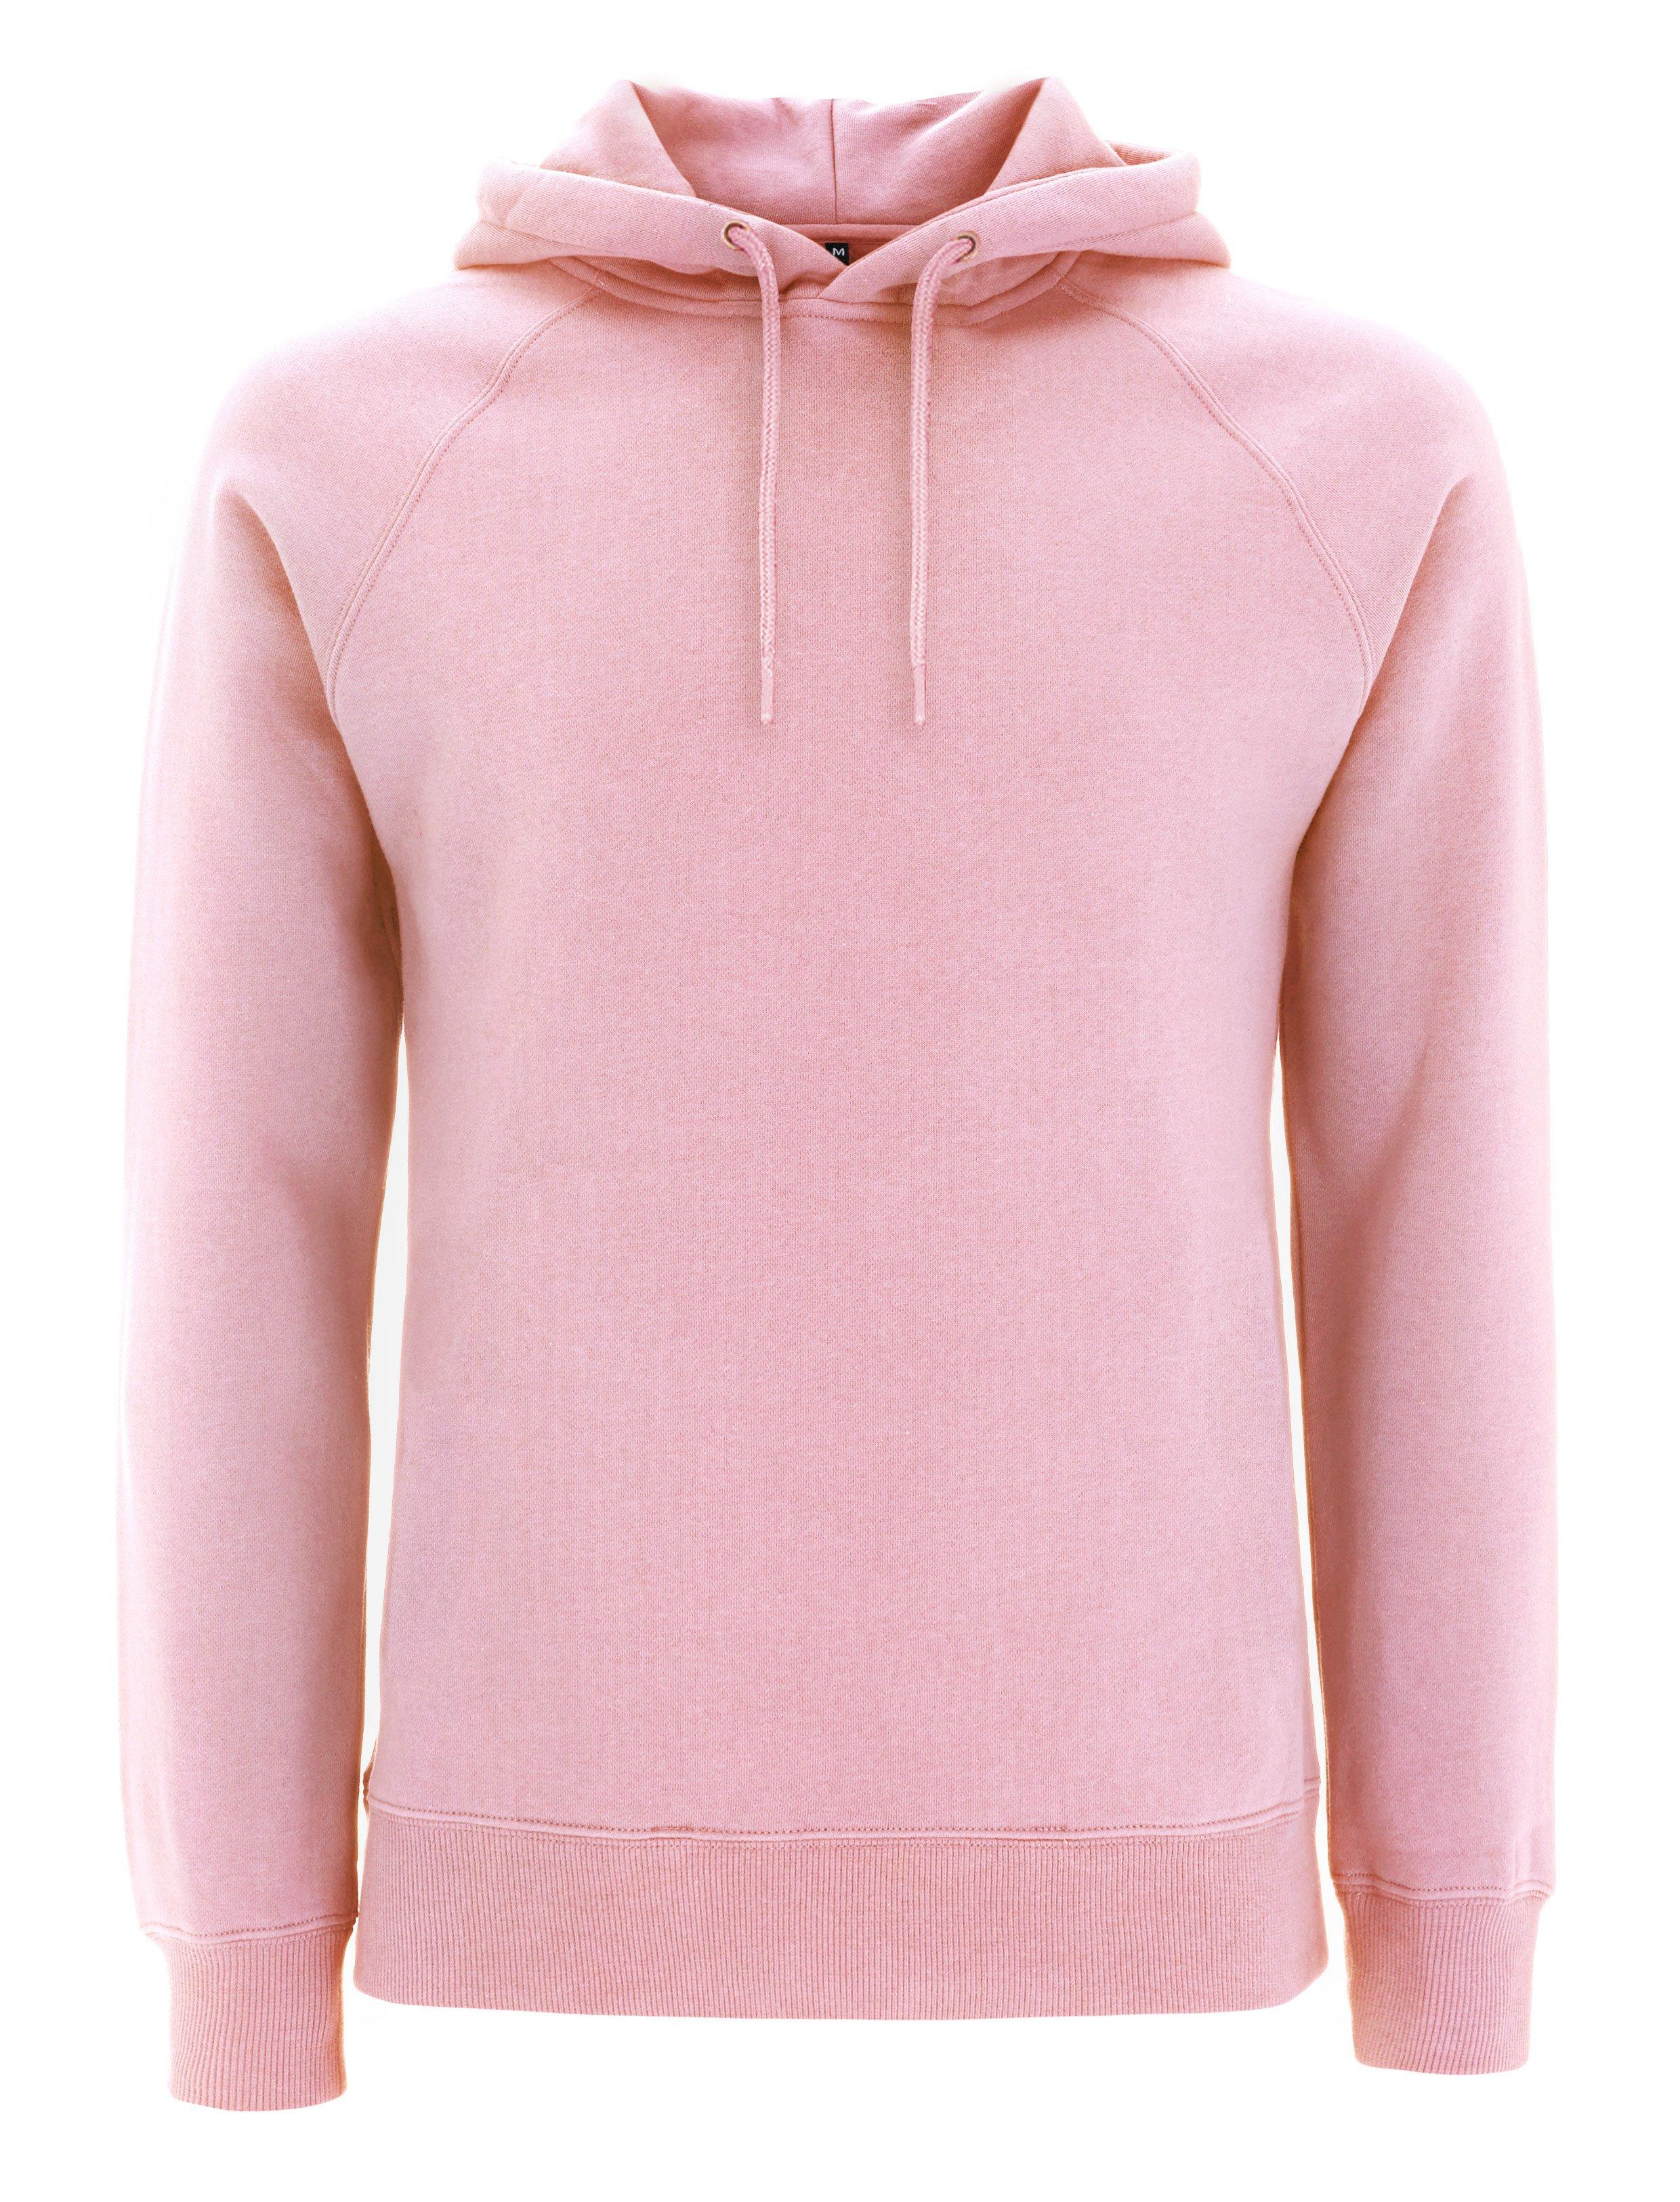 N55P-Candy-Pink.jpg